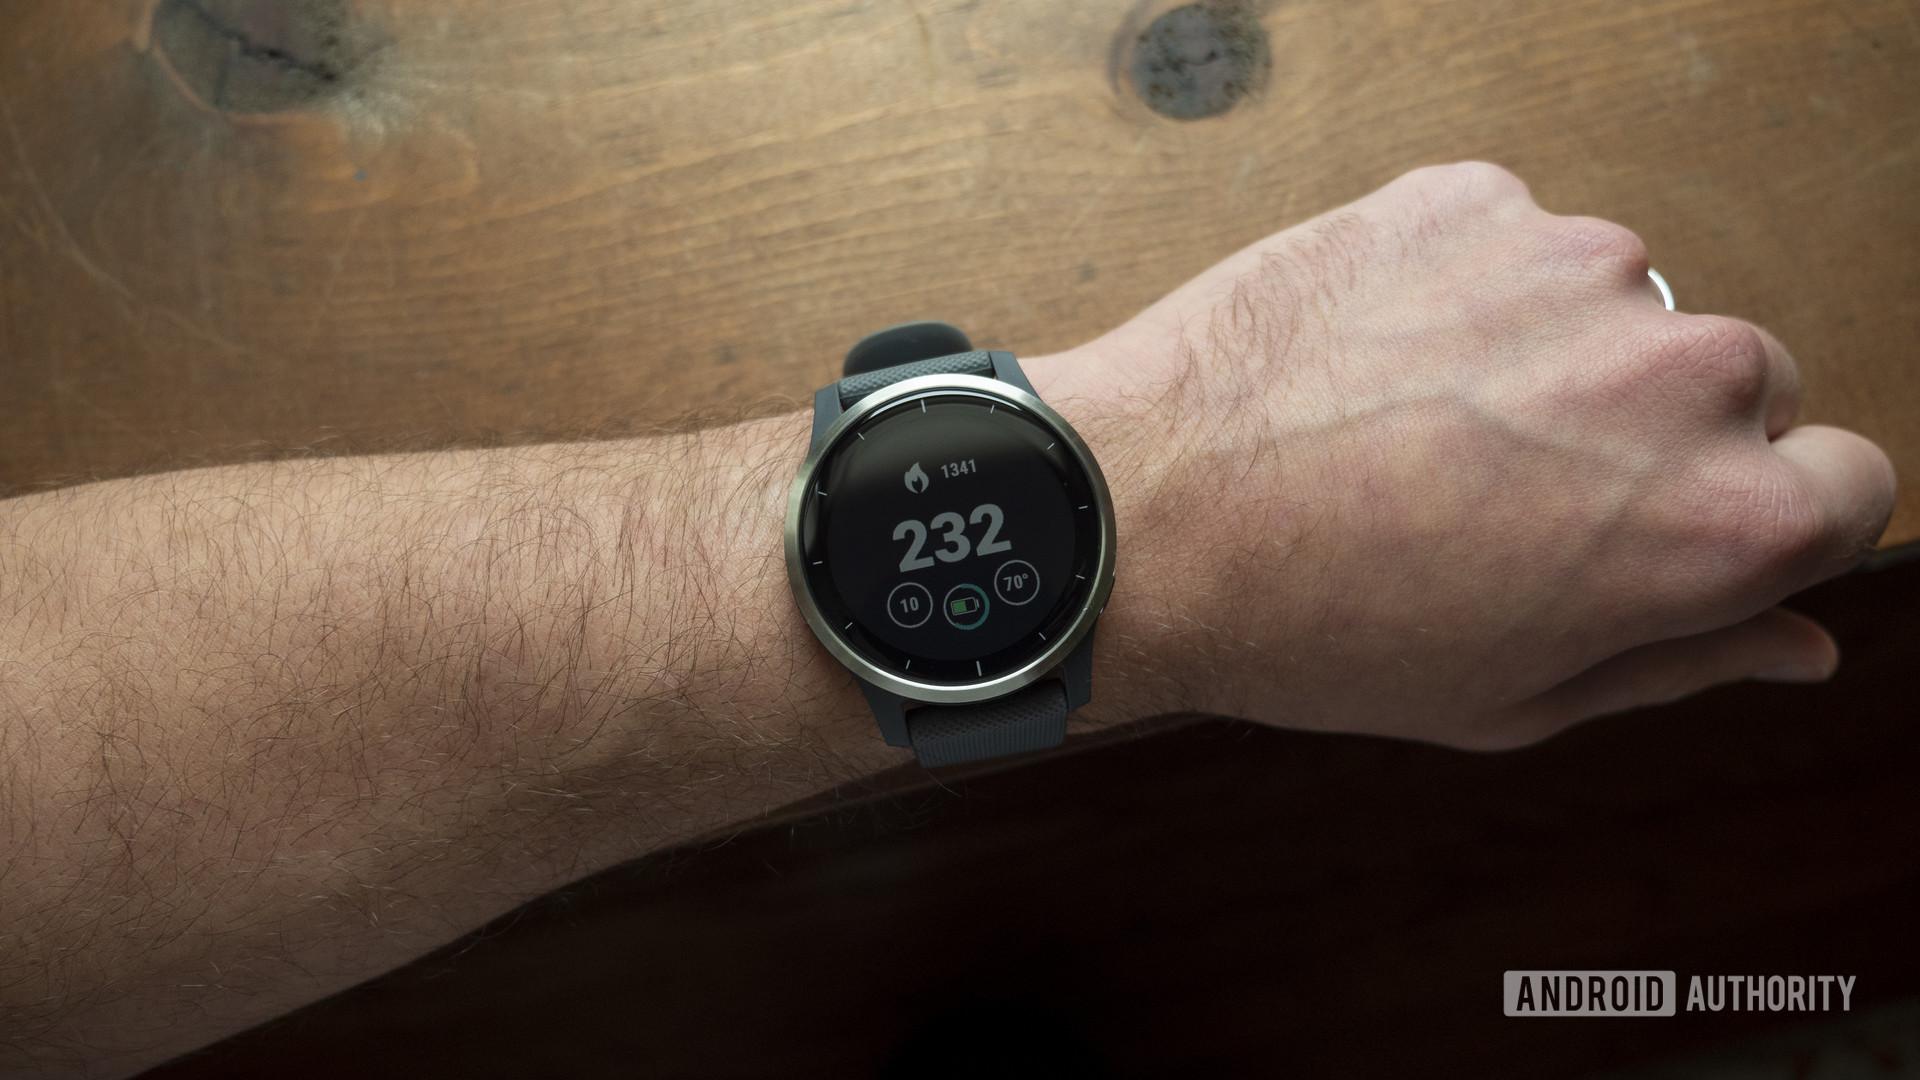 garmin vivoactive 4 review watch face display on wrist